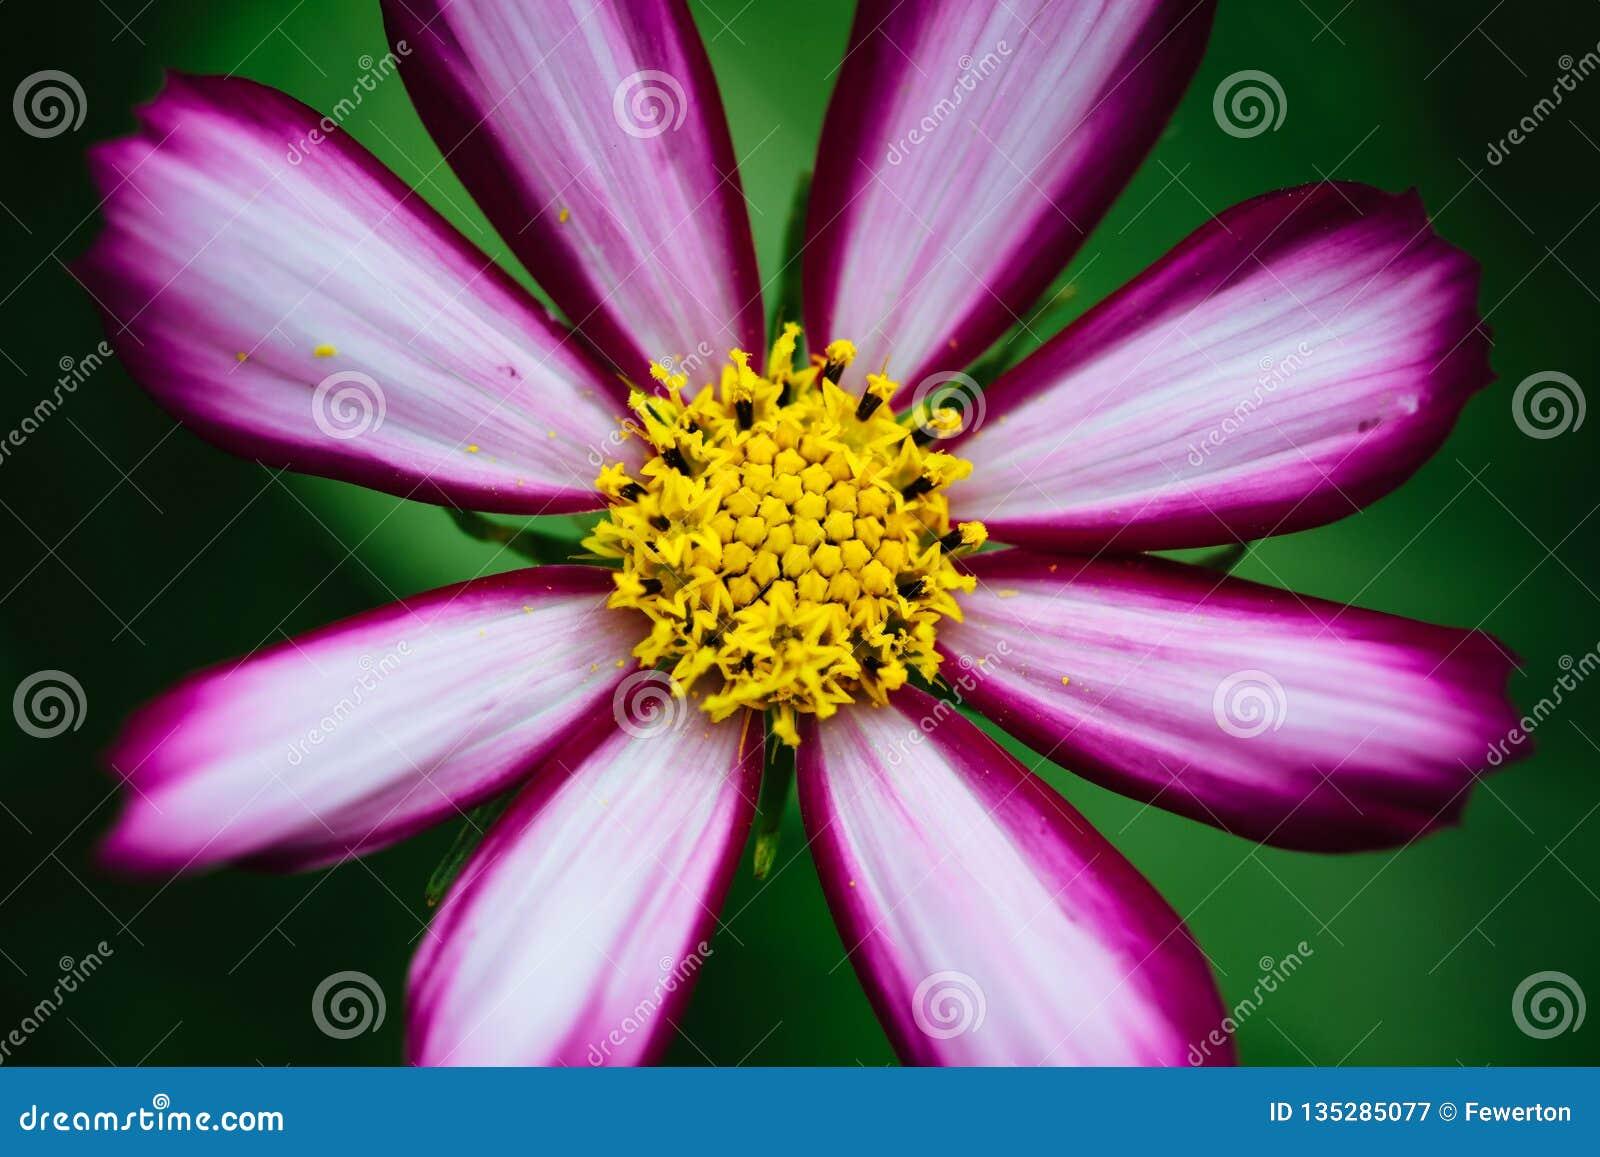 "Purple, white, vivid pink wild flower ""Wild Cosmos Flower"" Cosmos bipinnatus blooming during Spring and Summer"